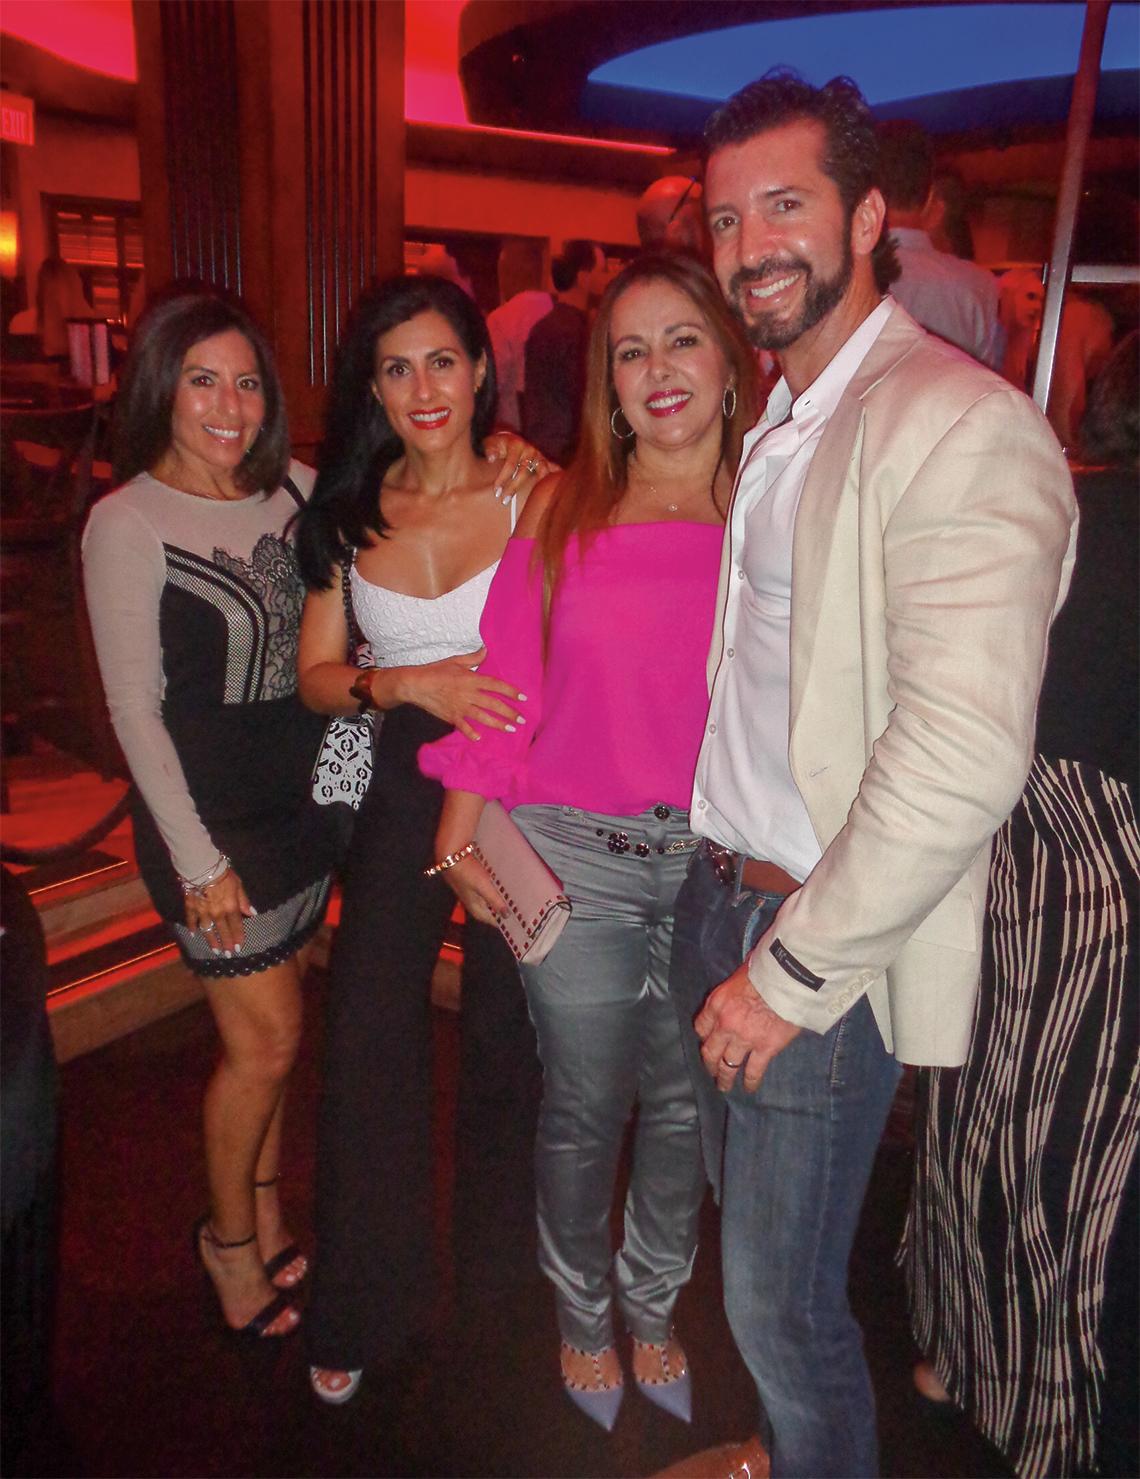 Haley Russell, Itzamar Herrera Venegas, Sara Slatkoff and Renato M. Silva.